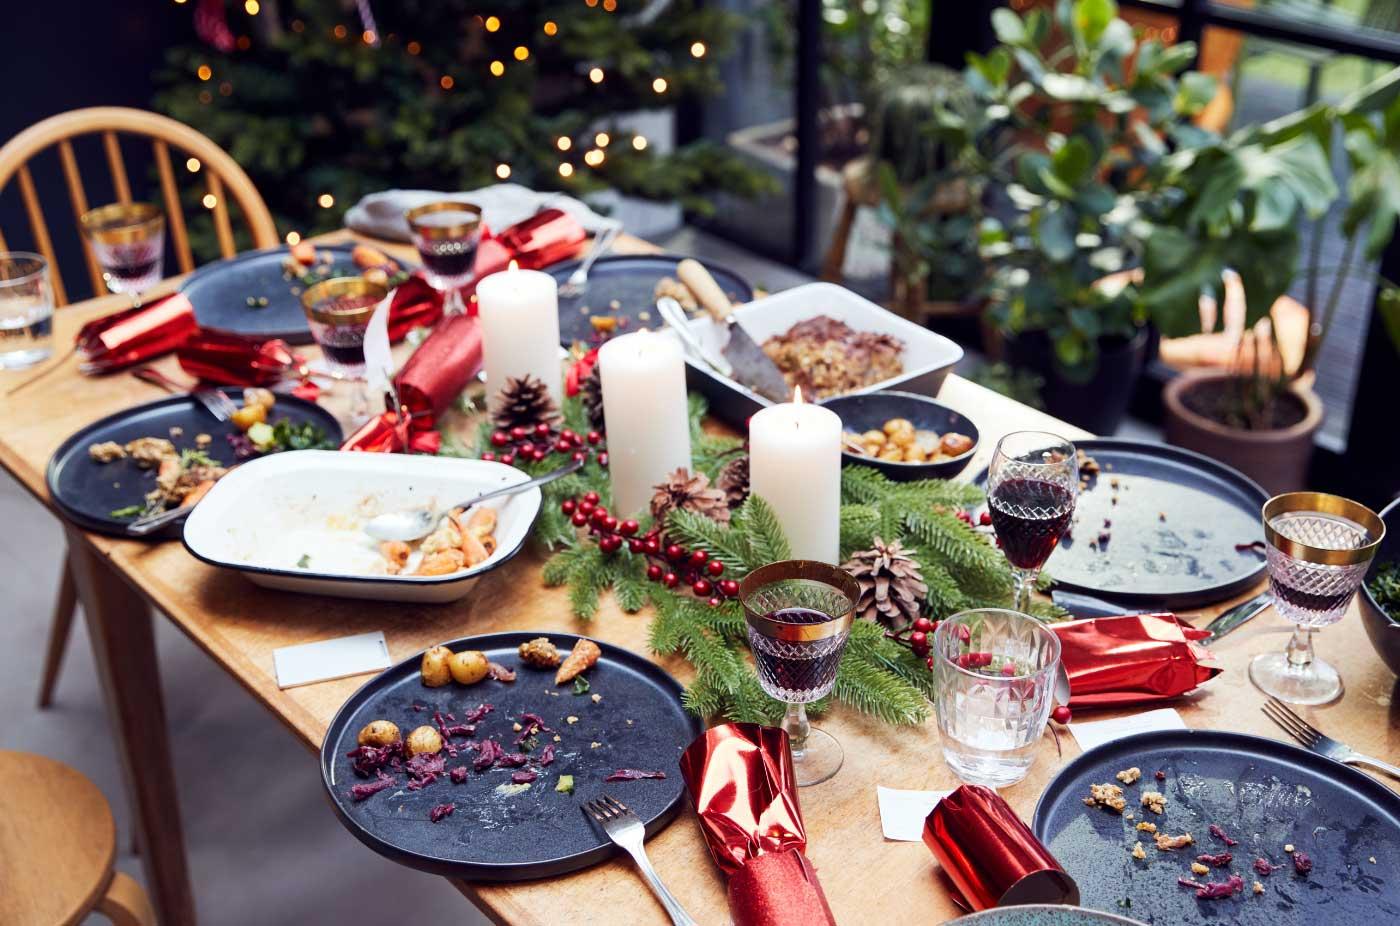 Christmas Lunch In Melbourne Melbourne Food Festivals